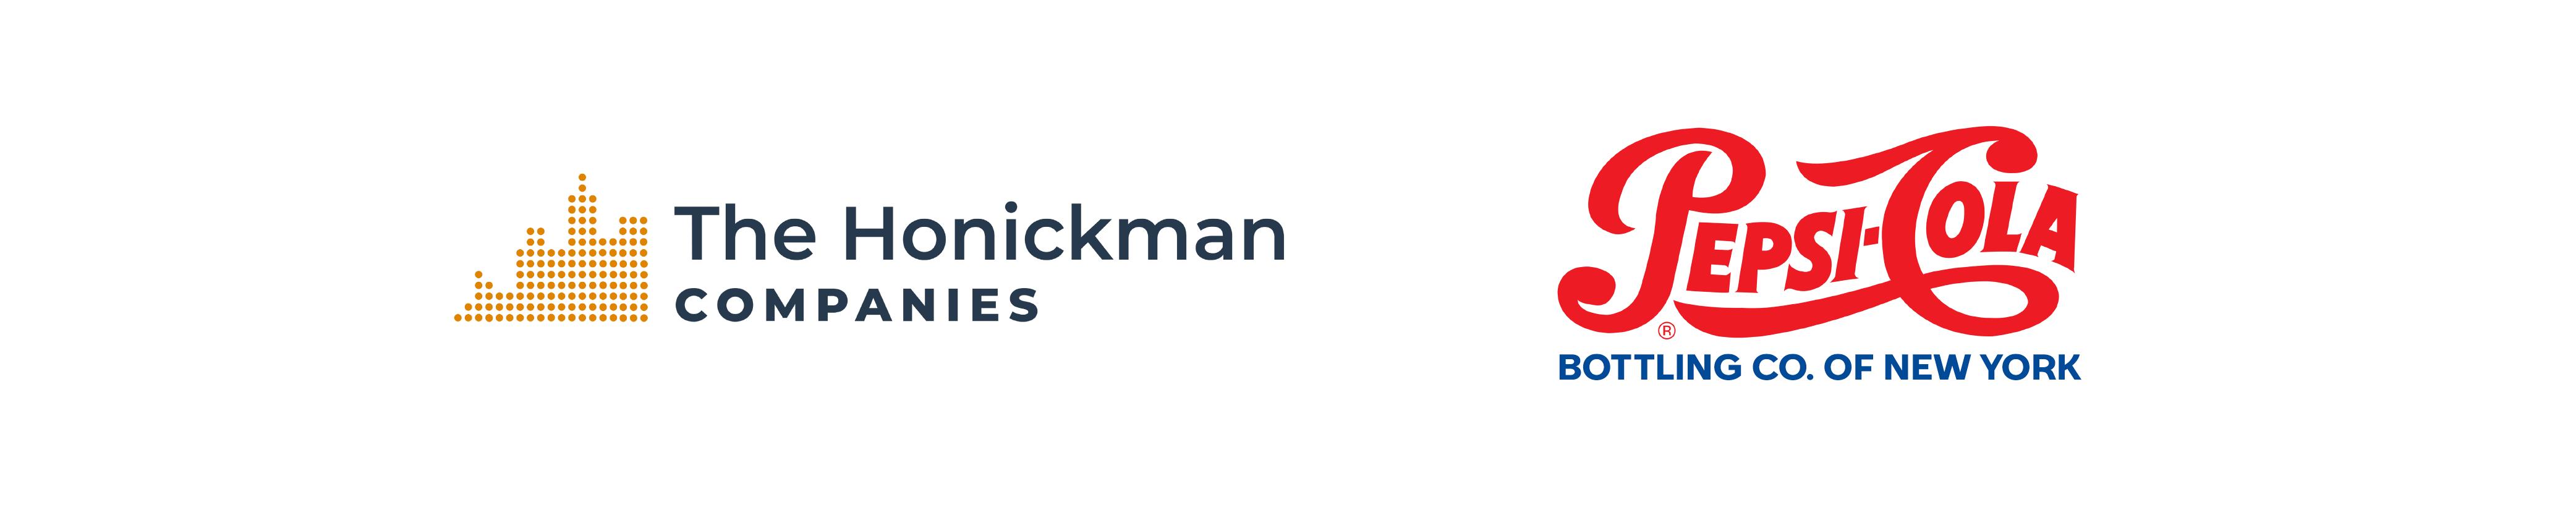 Honickman Companies, Pepsi-Cola Bottling Co. of New York